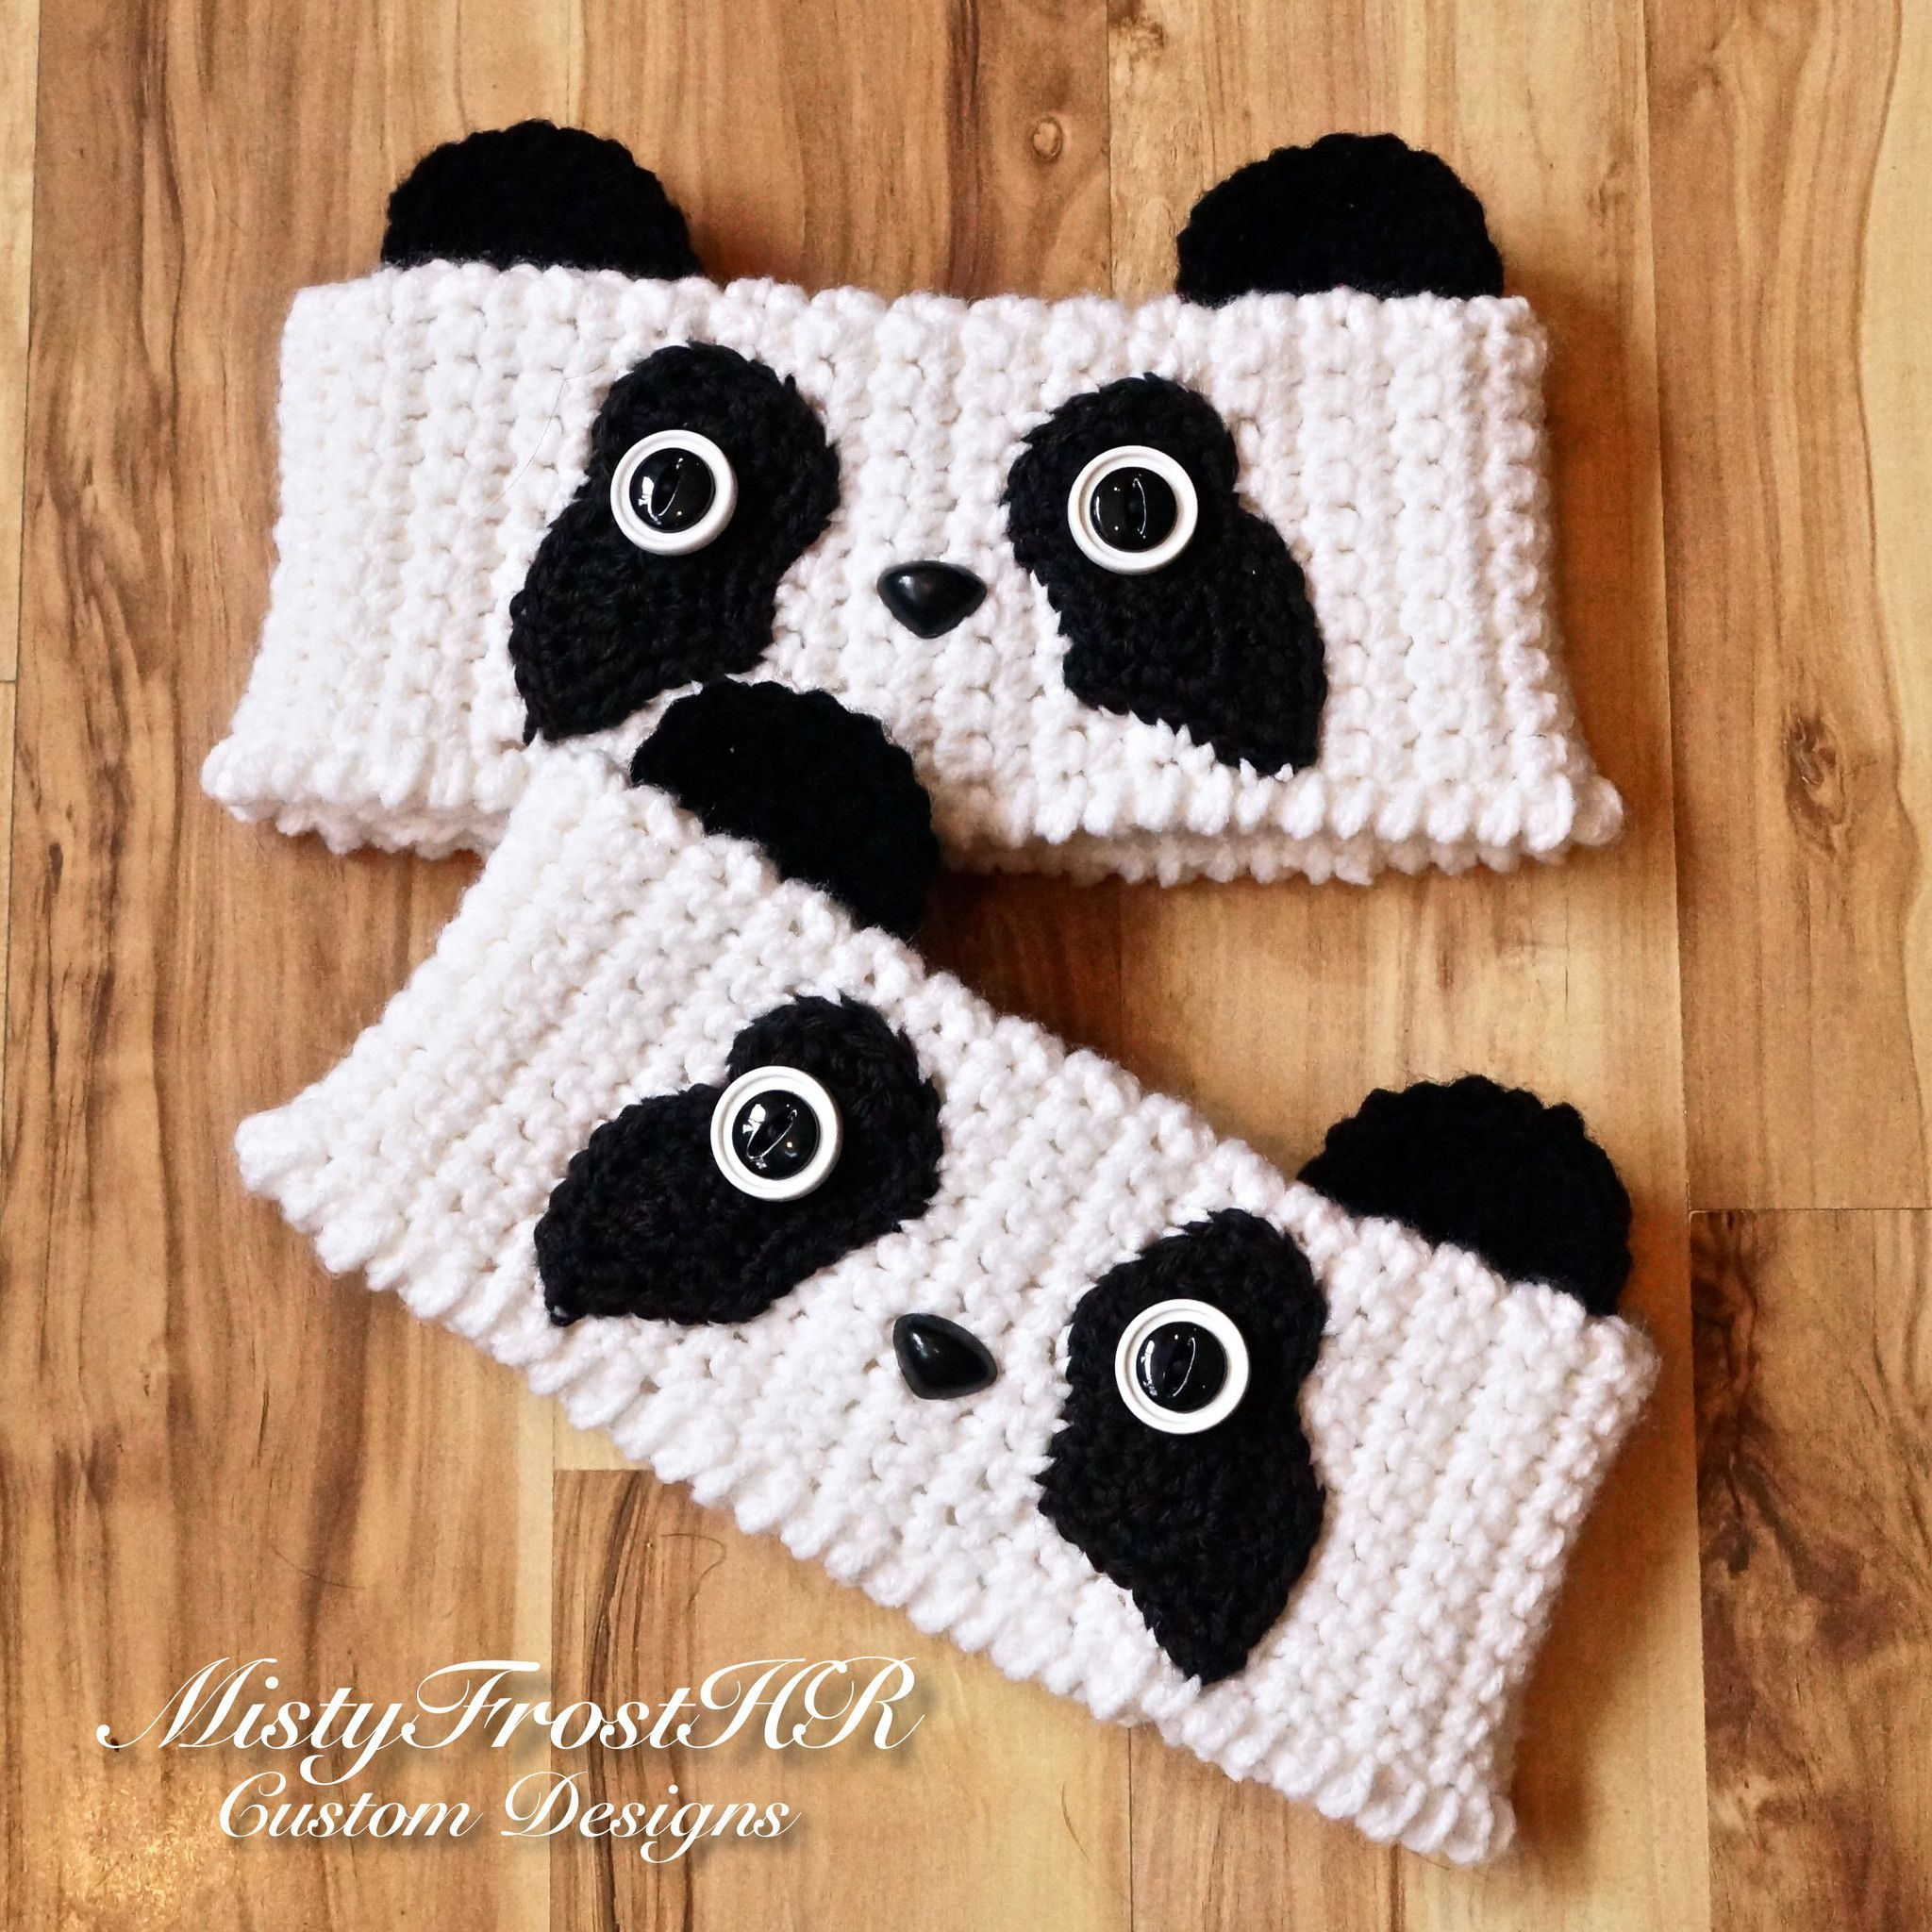 Crochet Perfectly Panda Bear Boot Cuff Toppers … | Pinteres…